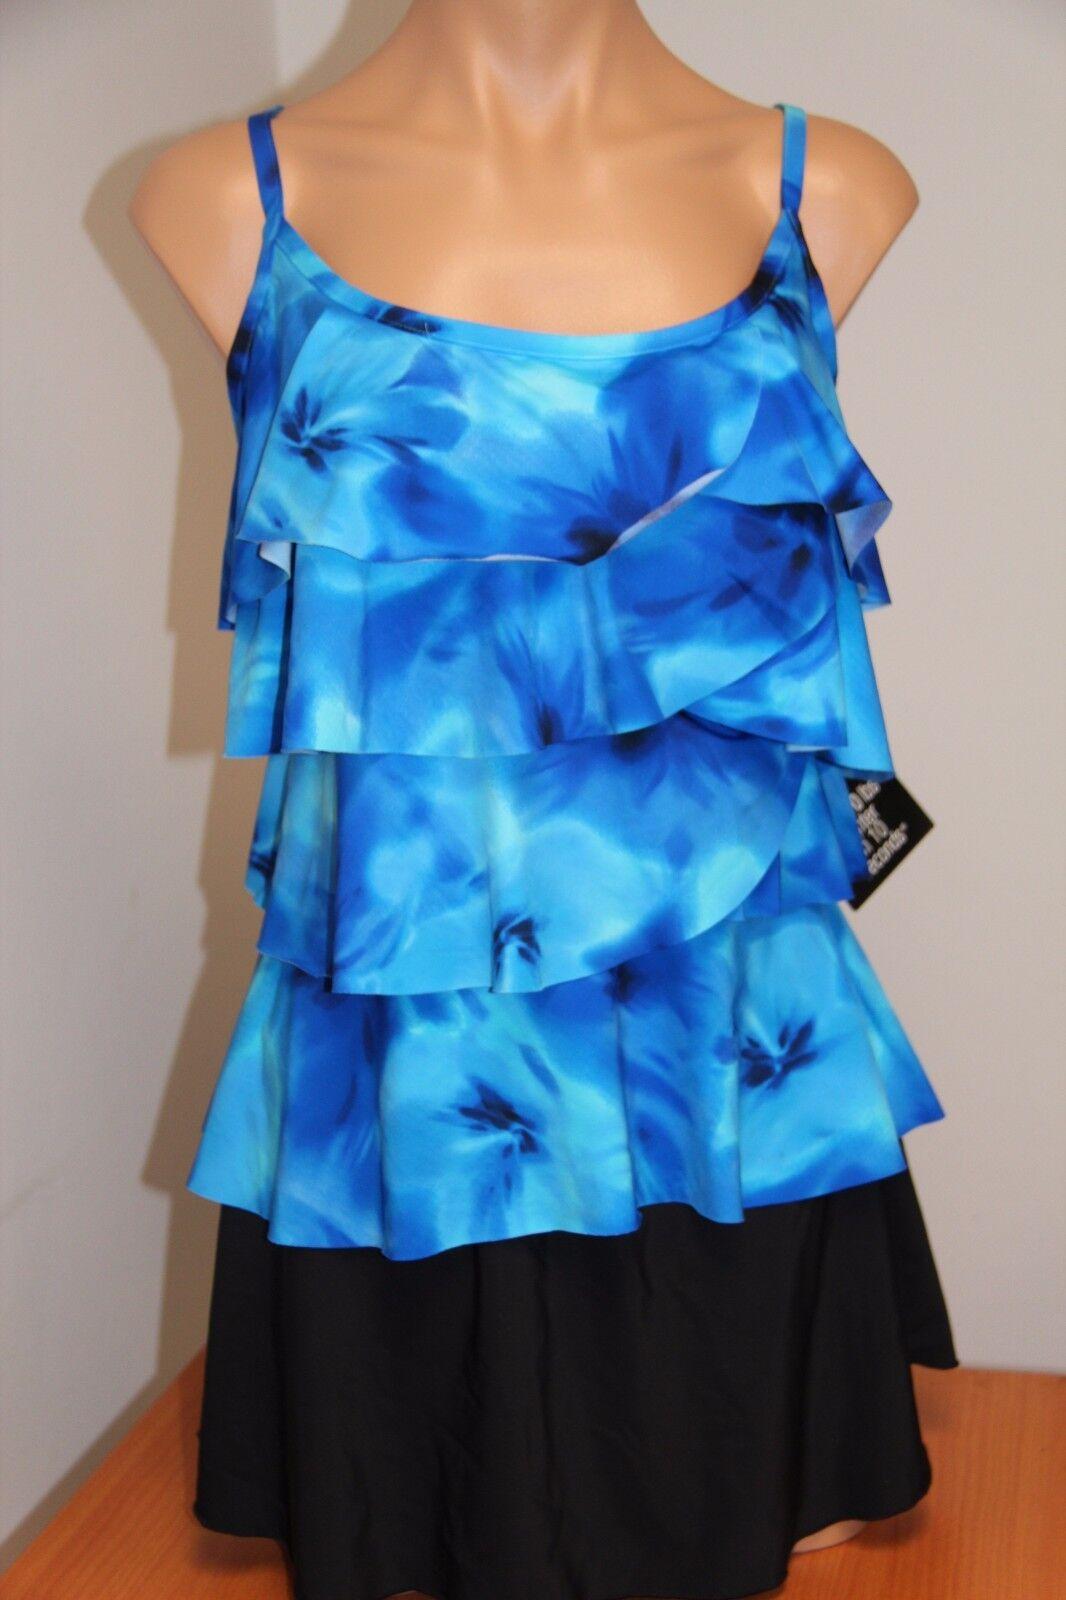 NWT Miraclesuit Swimsuit Bikini Tankini 2 pc set sz 8 blue Ocn Dream Tier Skirt